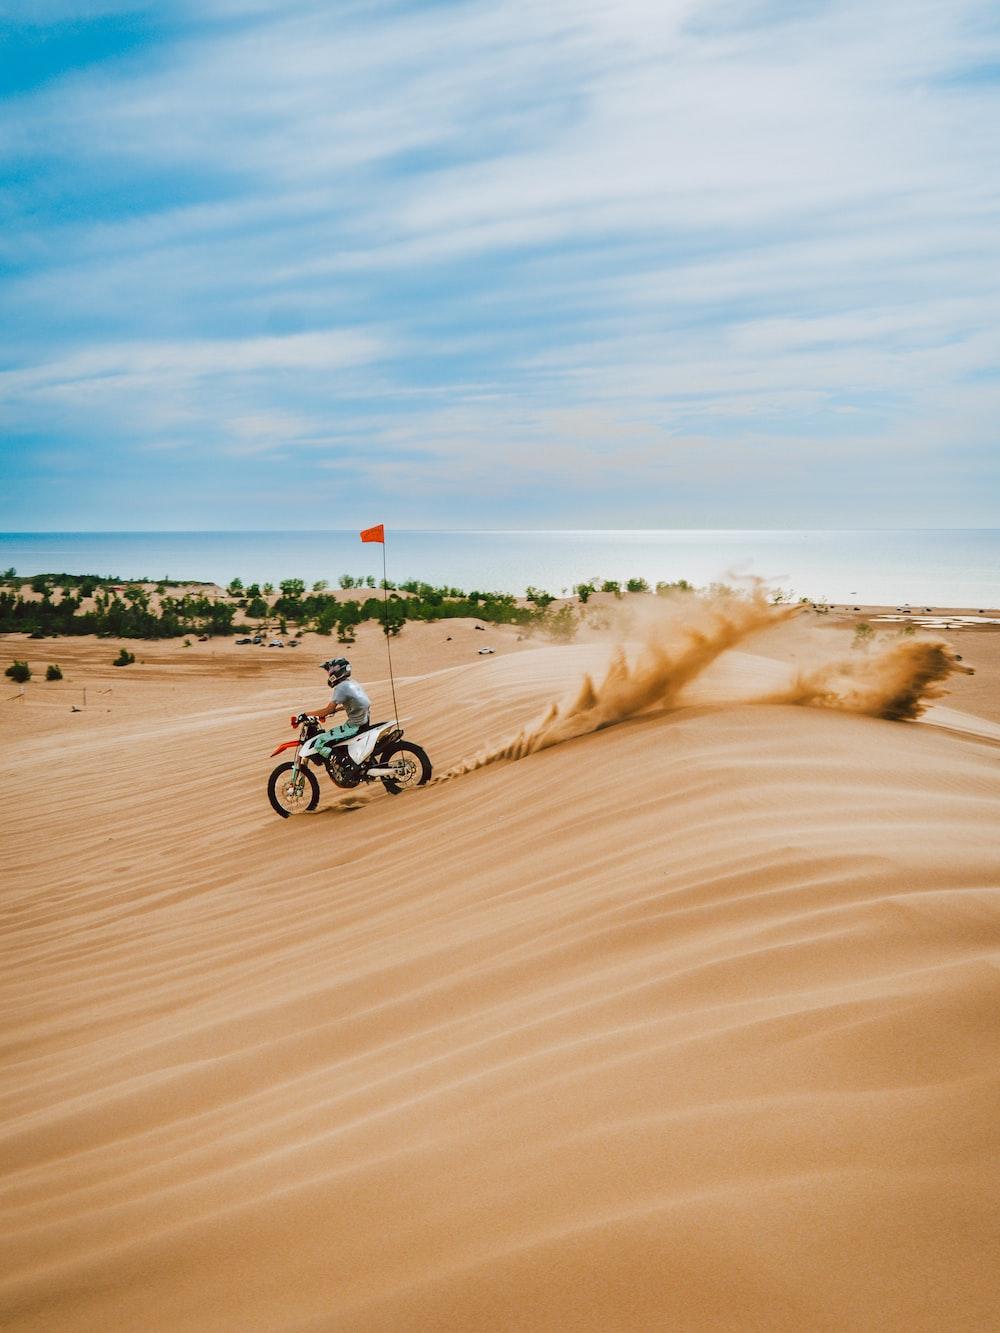 man riding motorcycle on brown sand during daytime